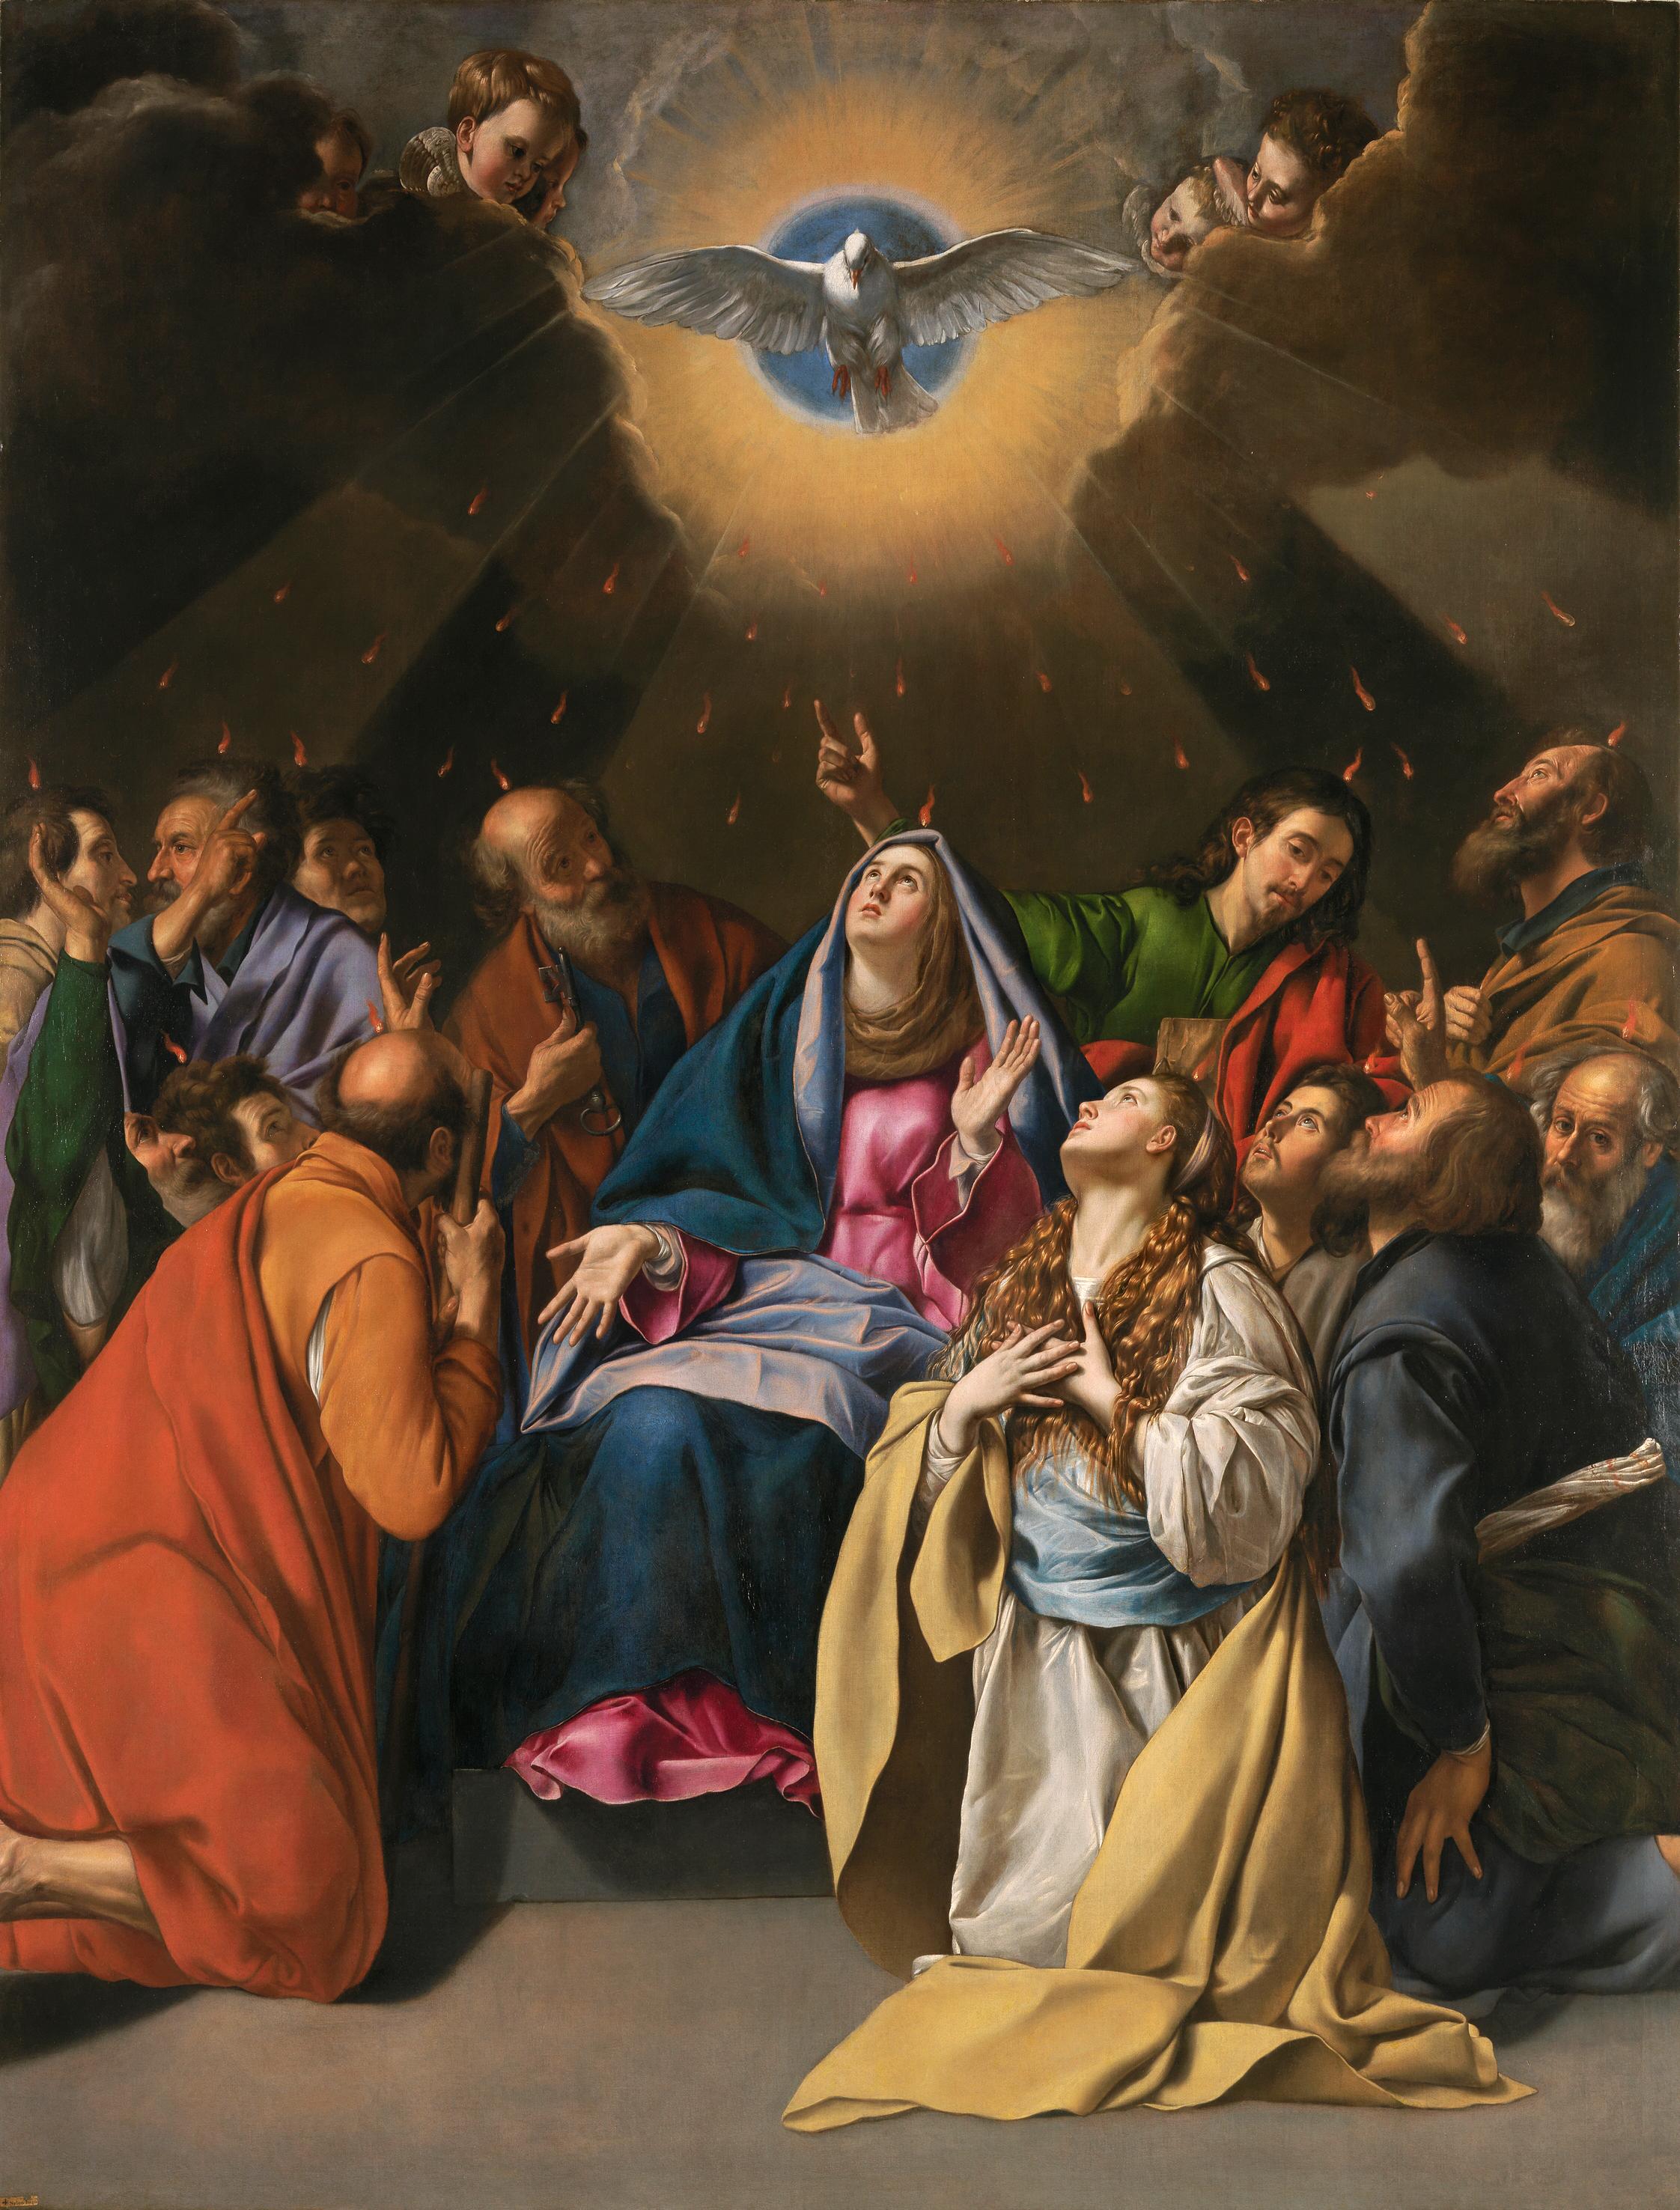 File:Maino Pentecostés, 1620-1625. Museo del Prado.jpg - Wikimedia Commons